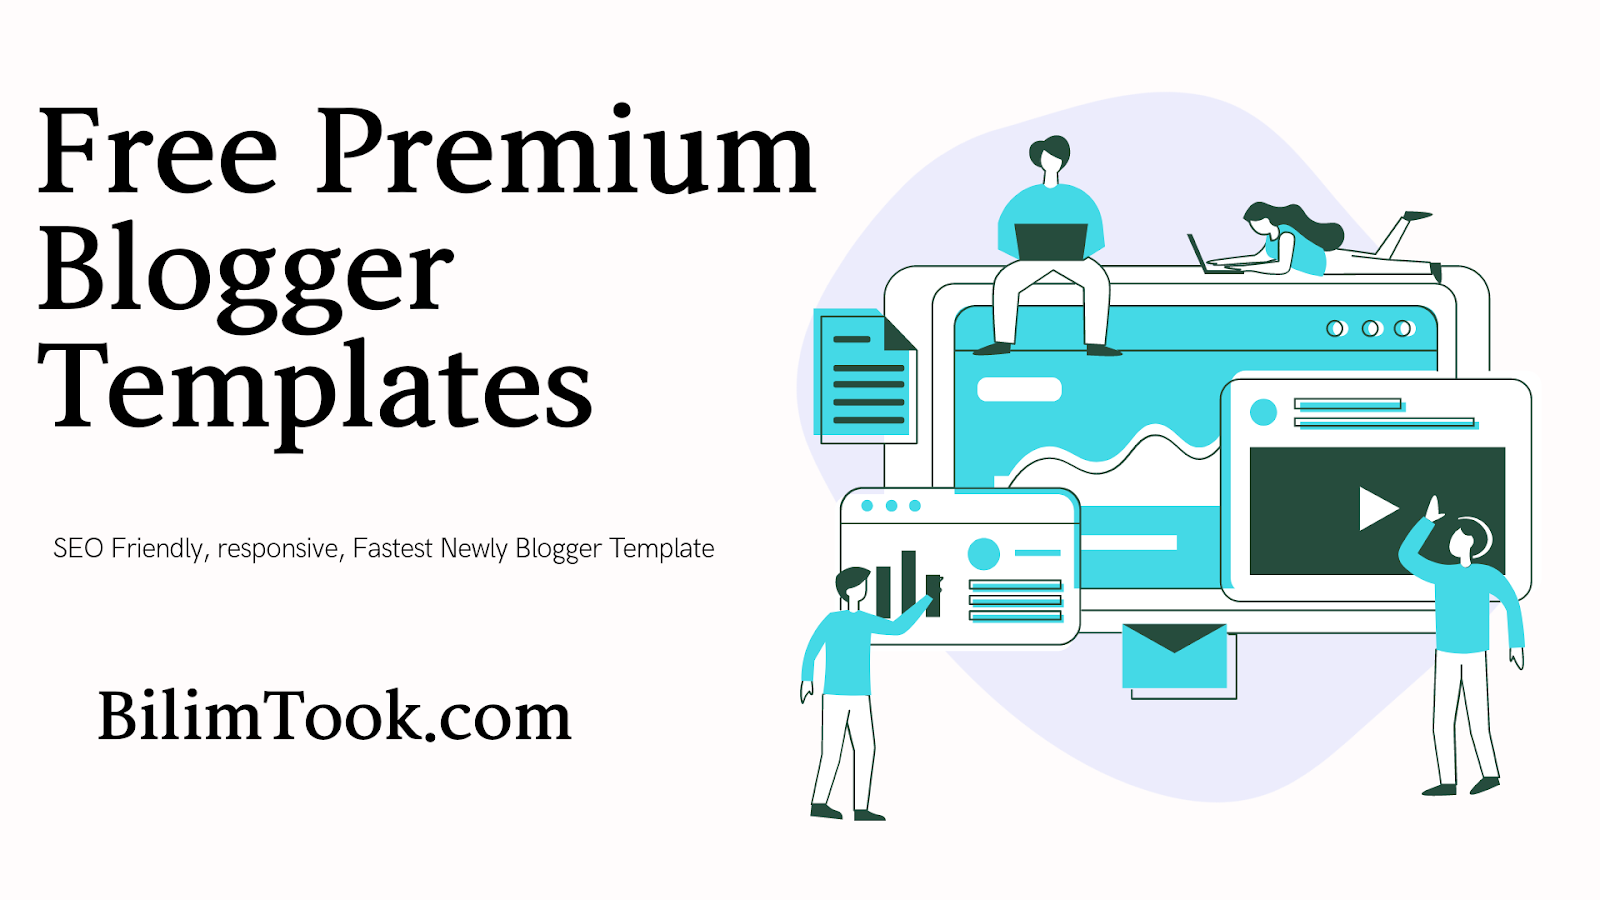 Free & Premium Blogger Templates 2020 [Daily Updates]